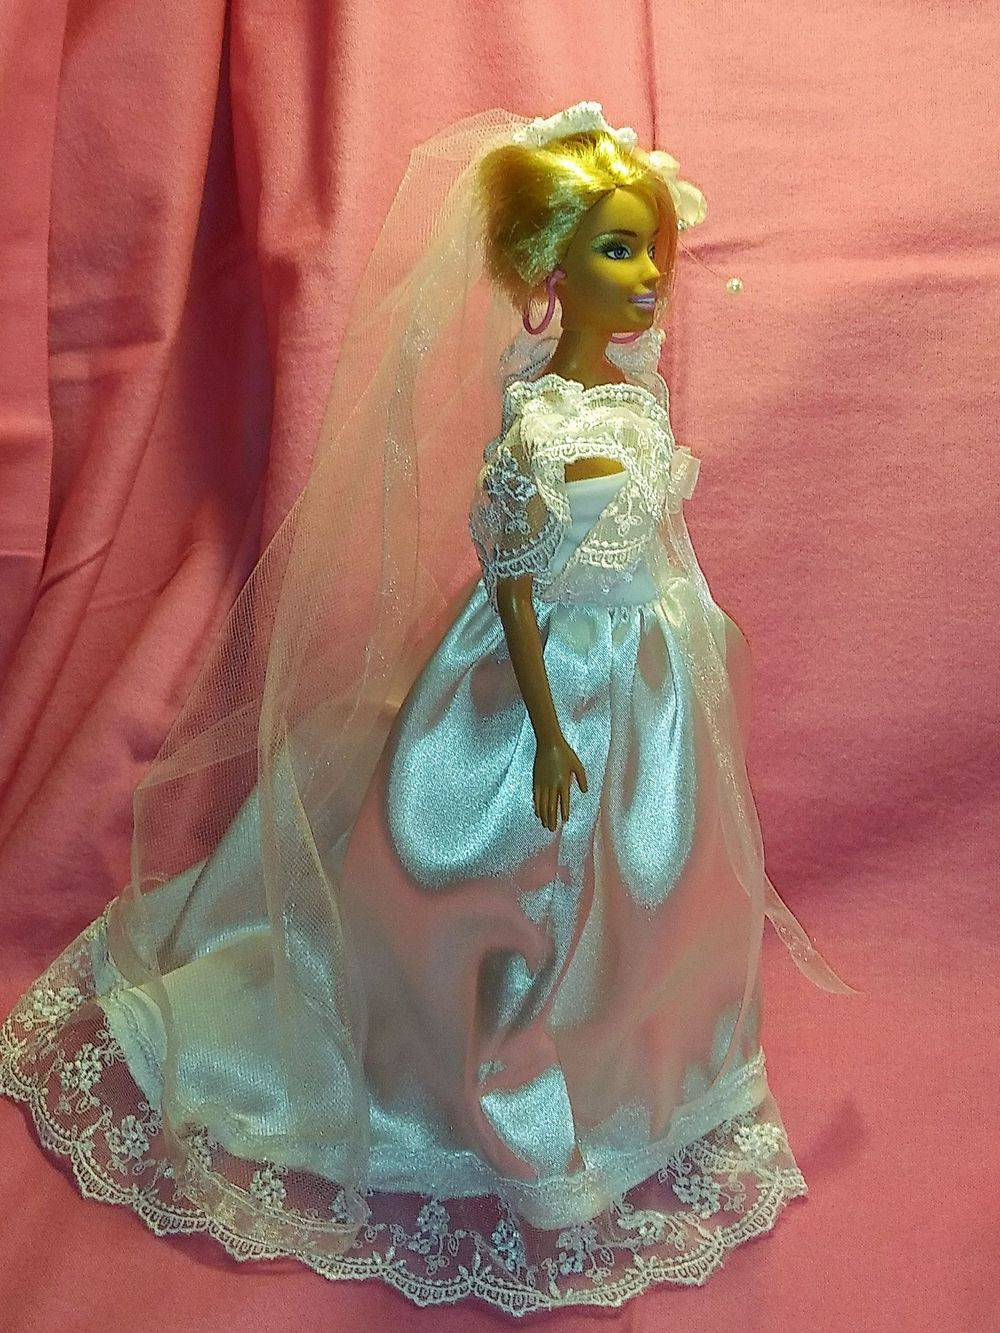 Barbie Wedding, Barbie Gown, Barbie clothes, Doll clothes, Fashion Doll Dresses